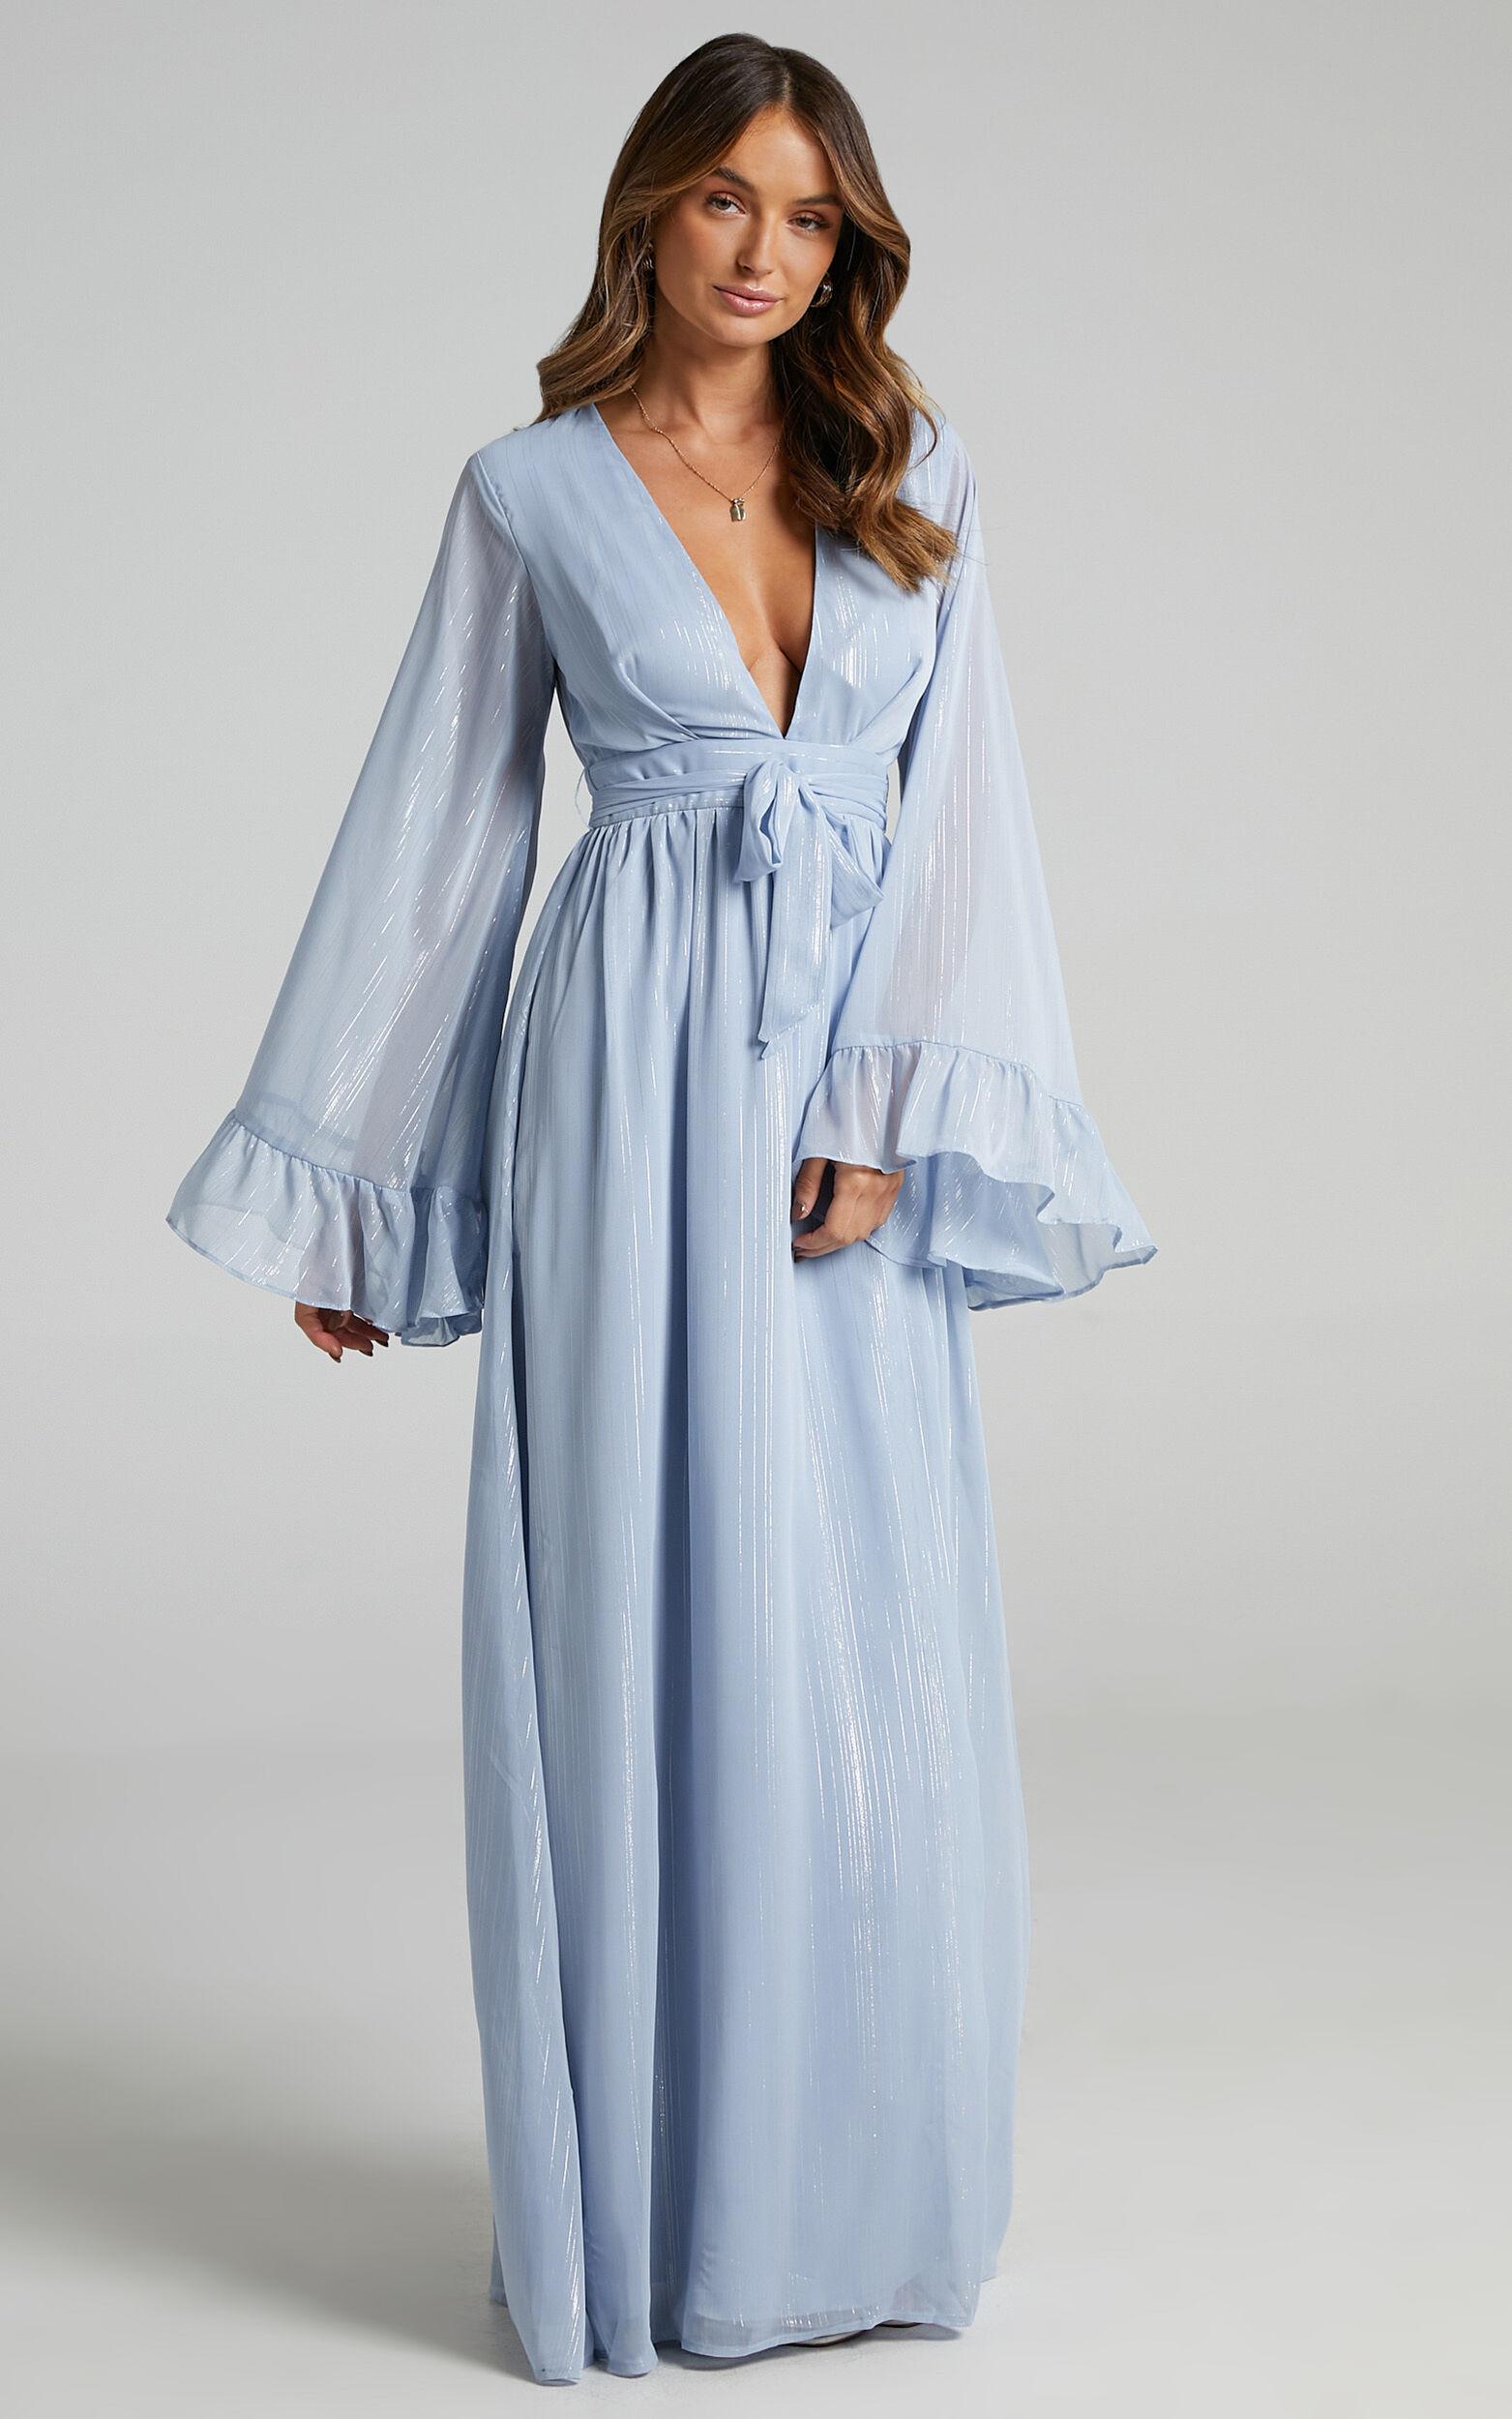 Dangerous Woman Maxi Dress in Light Blue - 06, BLU2, super-hi-res image number null